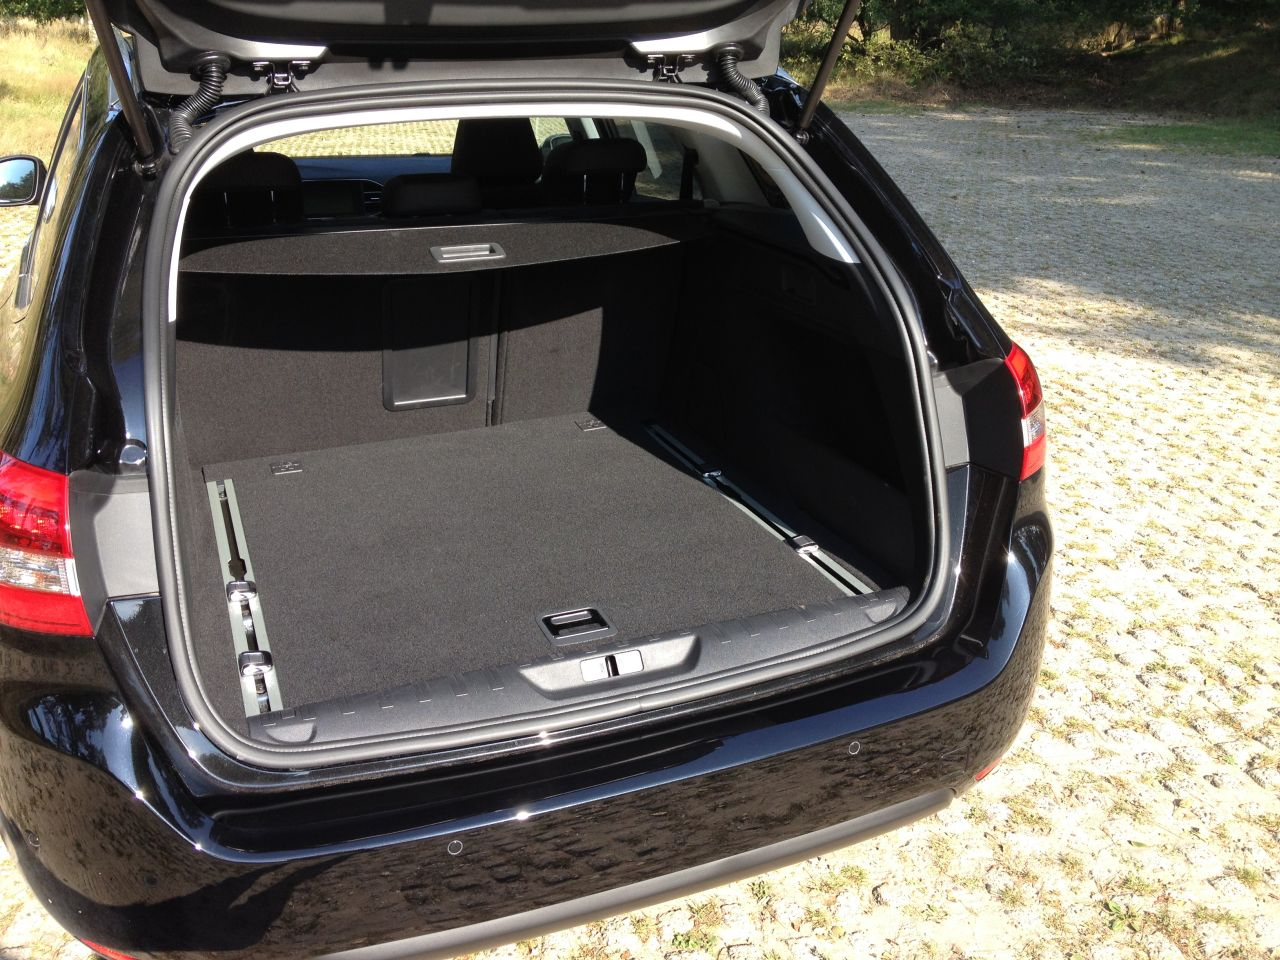 test peugeot 308 sw 1 2 puretech 130 carblogger. Black Bedroom Furniture Sets. Home Design Ideas